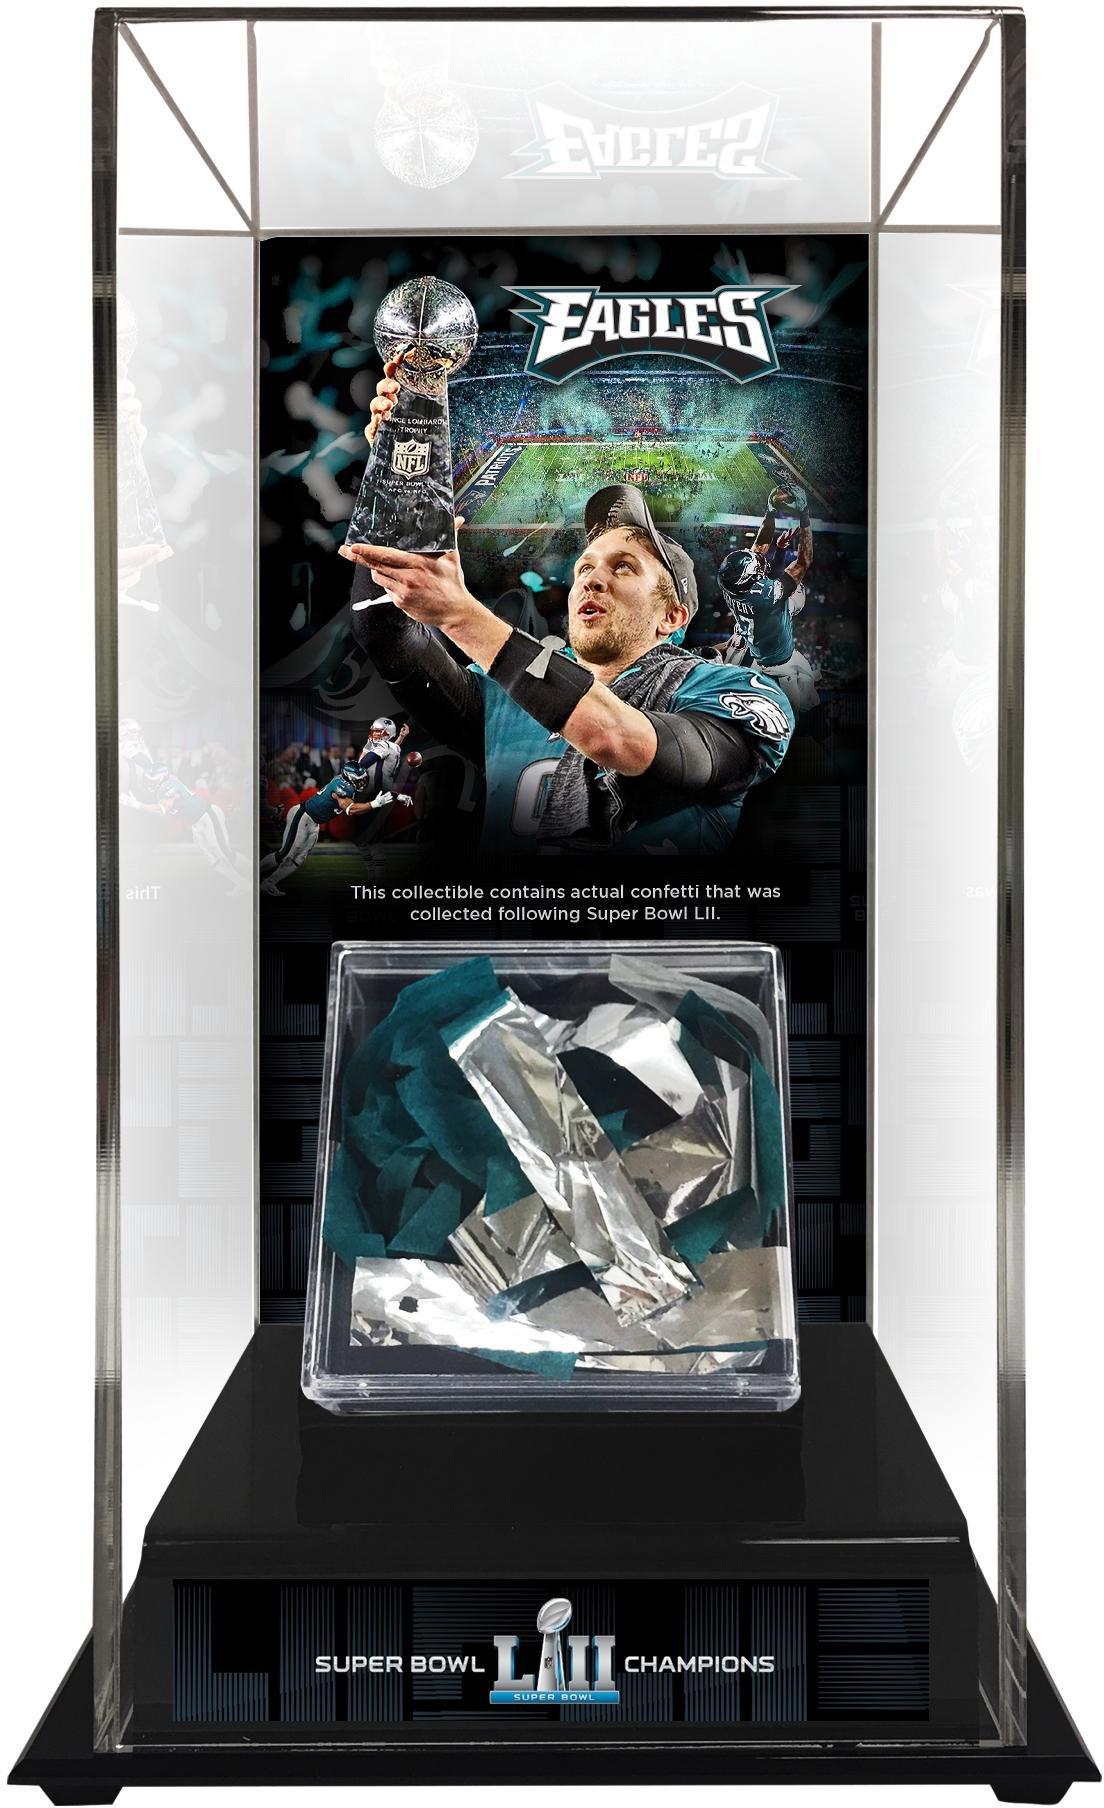 30ae6d8b13e Get Quotations · Sports Memorabilia Philadelphia Eagles Super Bowl LII  Champions Tall Display Case with Game-Used Confetti